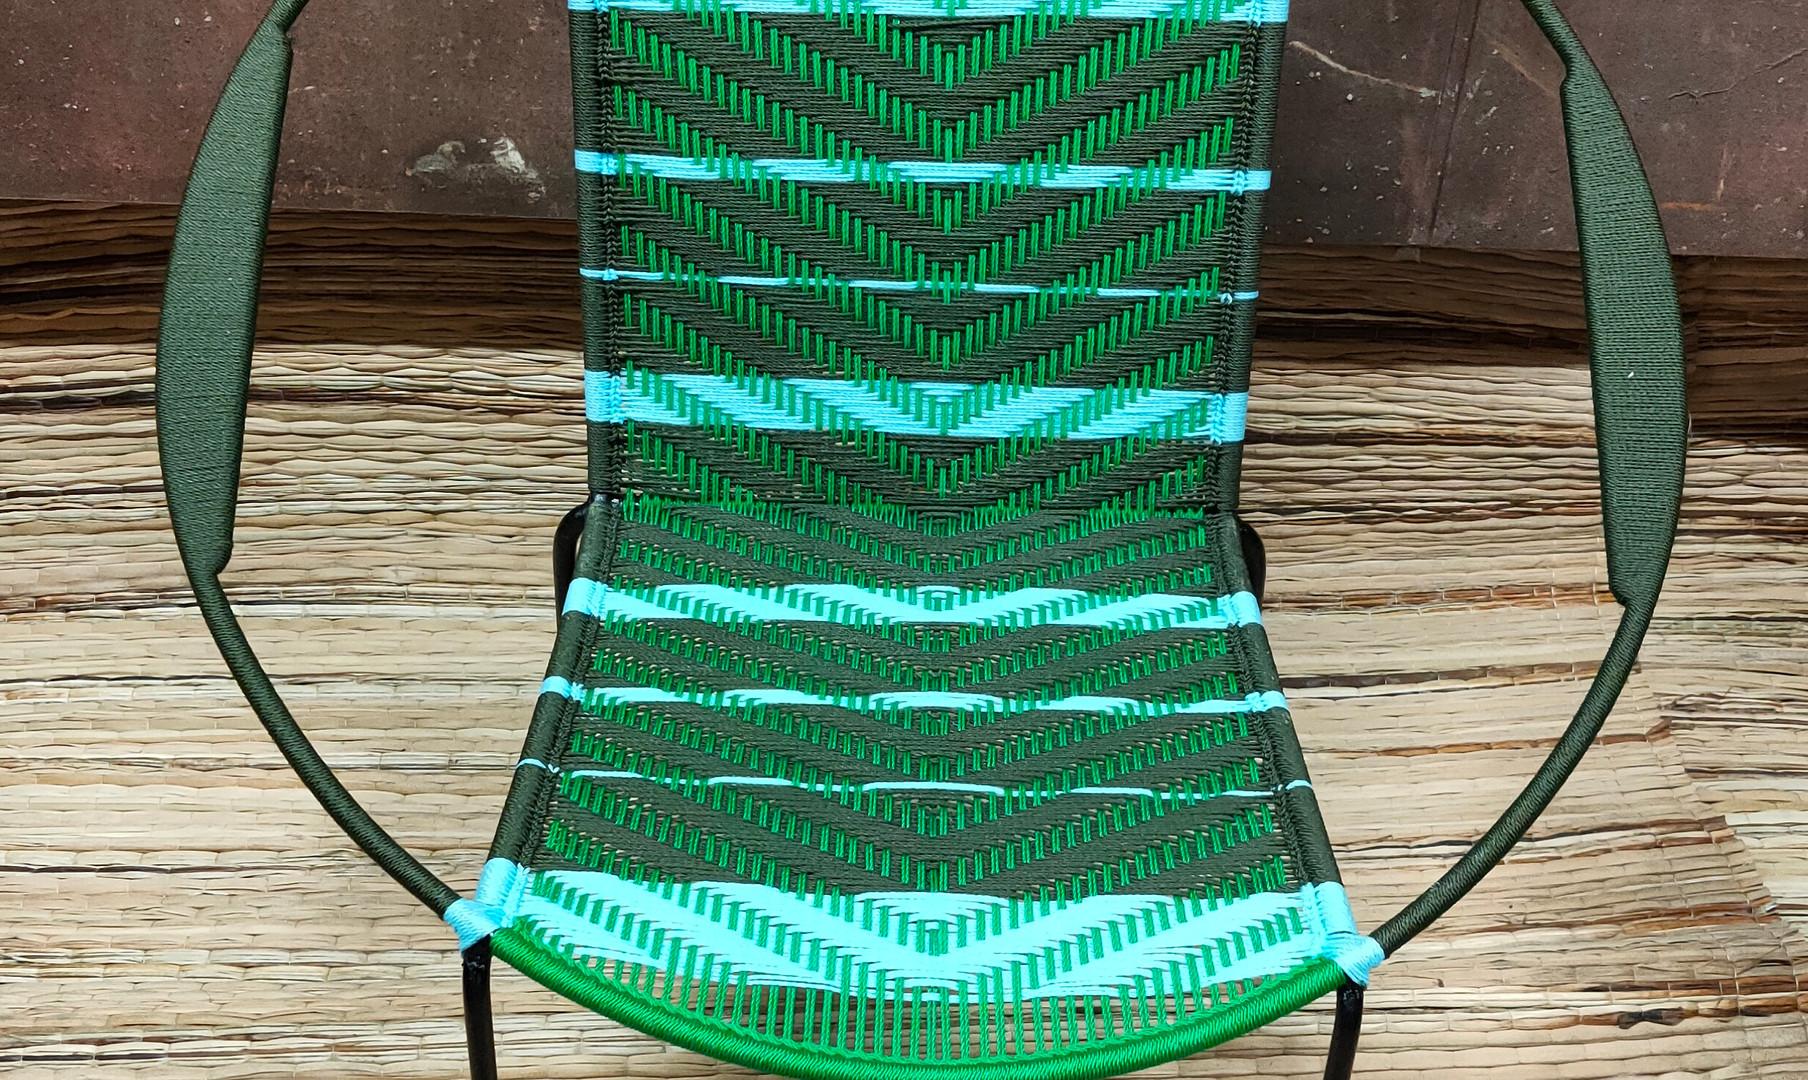 Kaki / vert / bandes turquoise